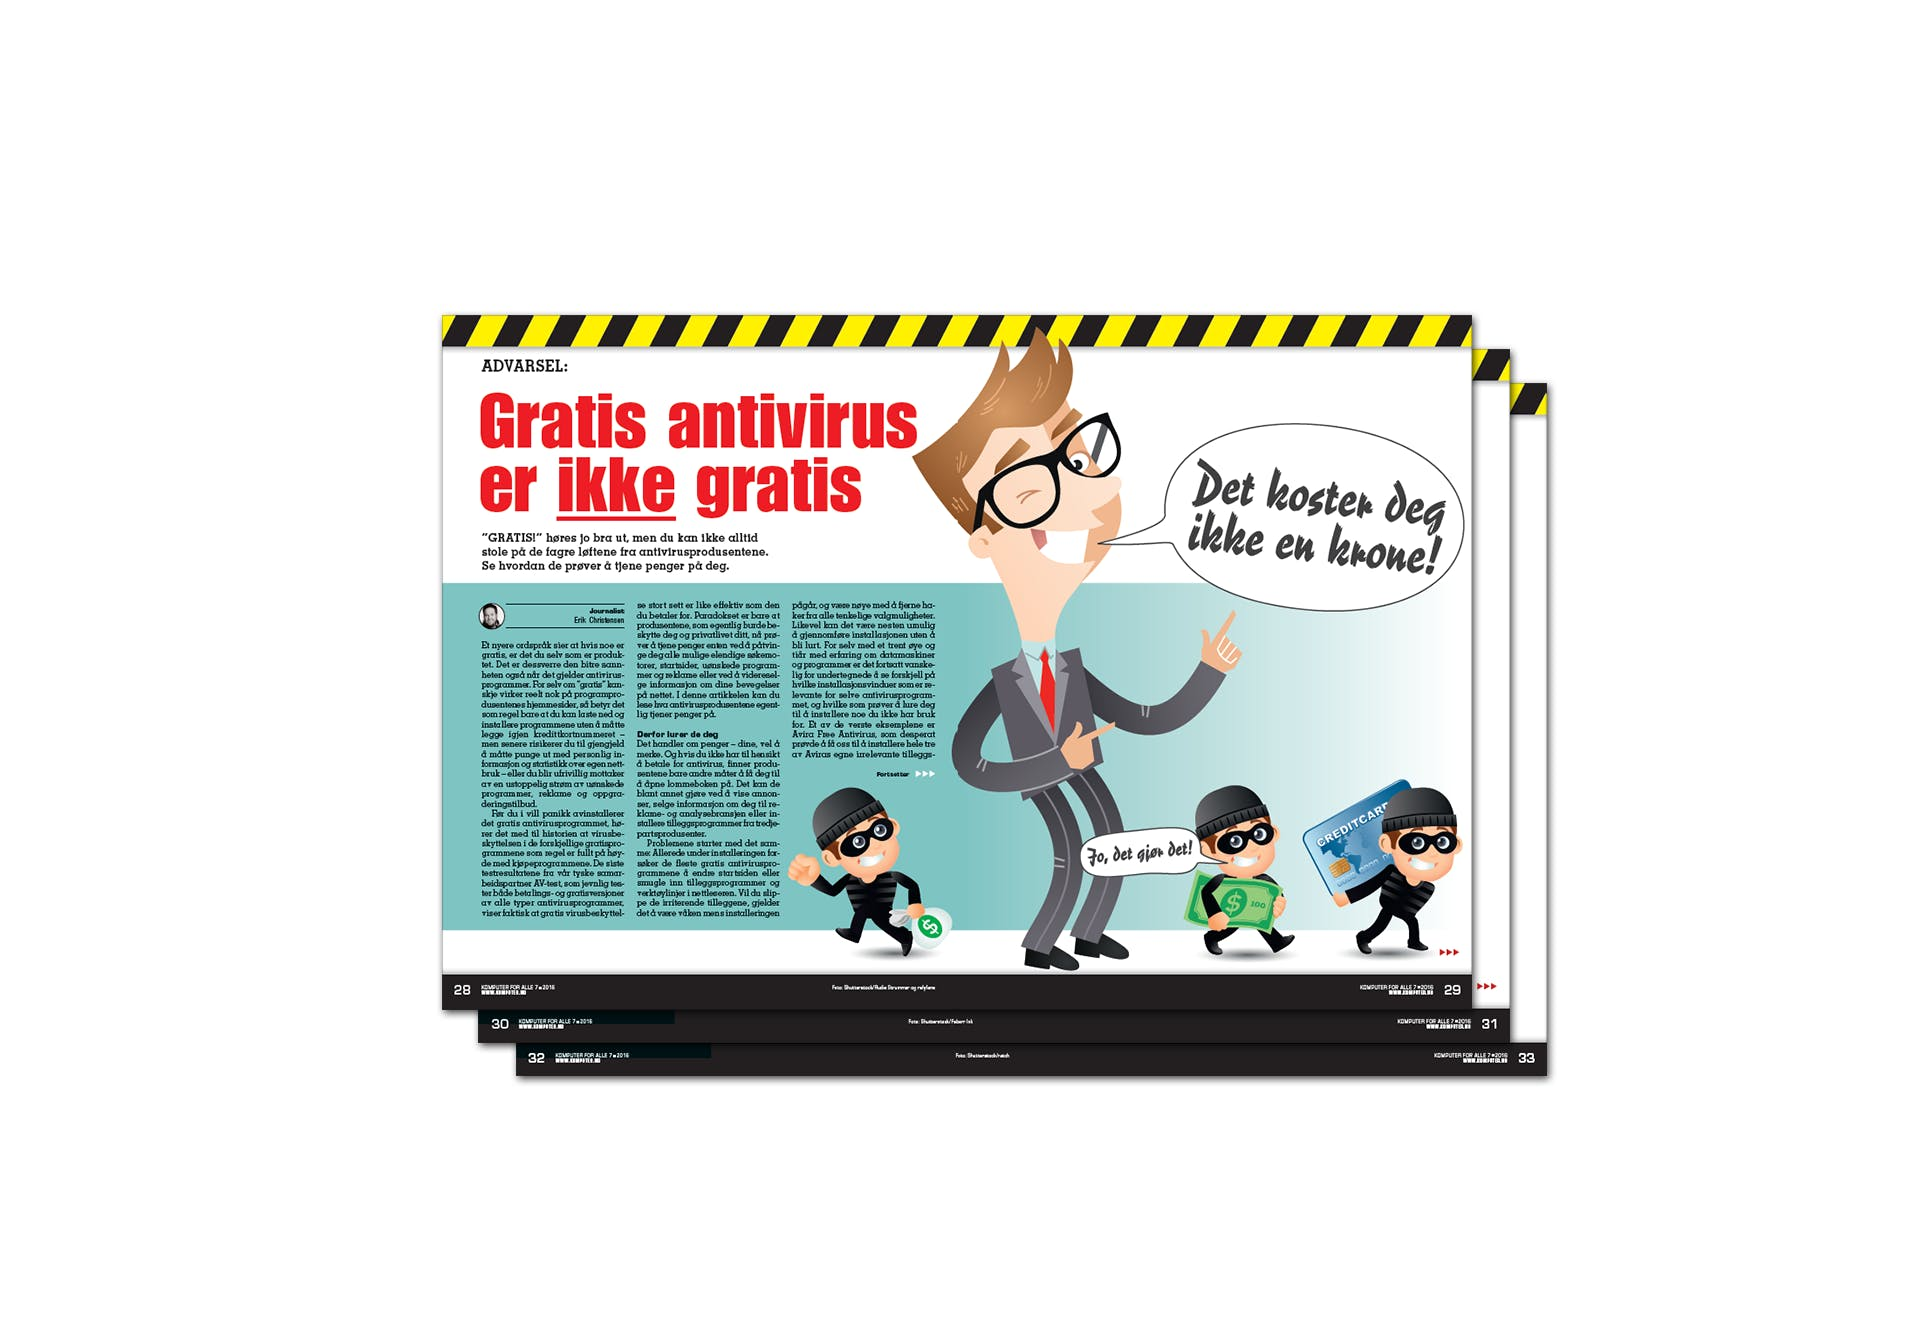 Dejtingsajt helt gratis antivirus